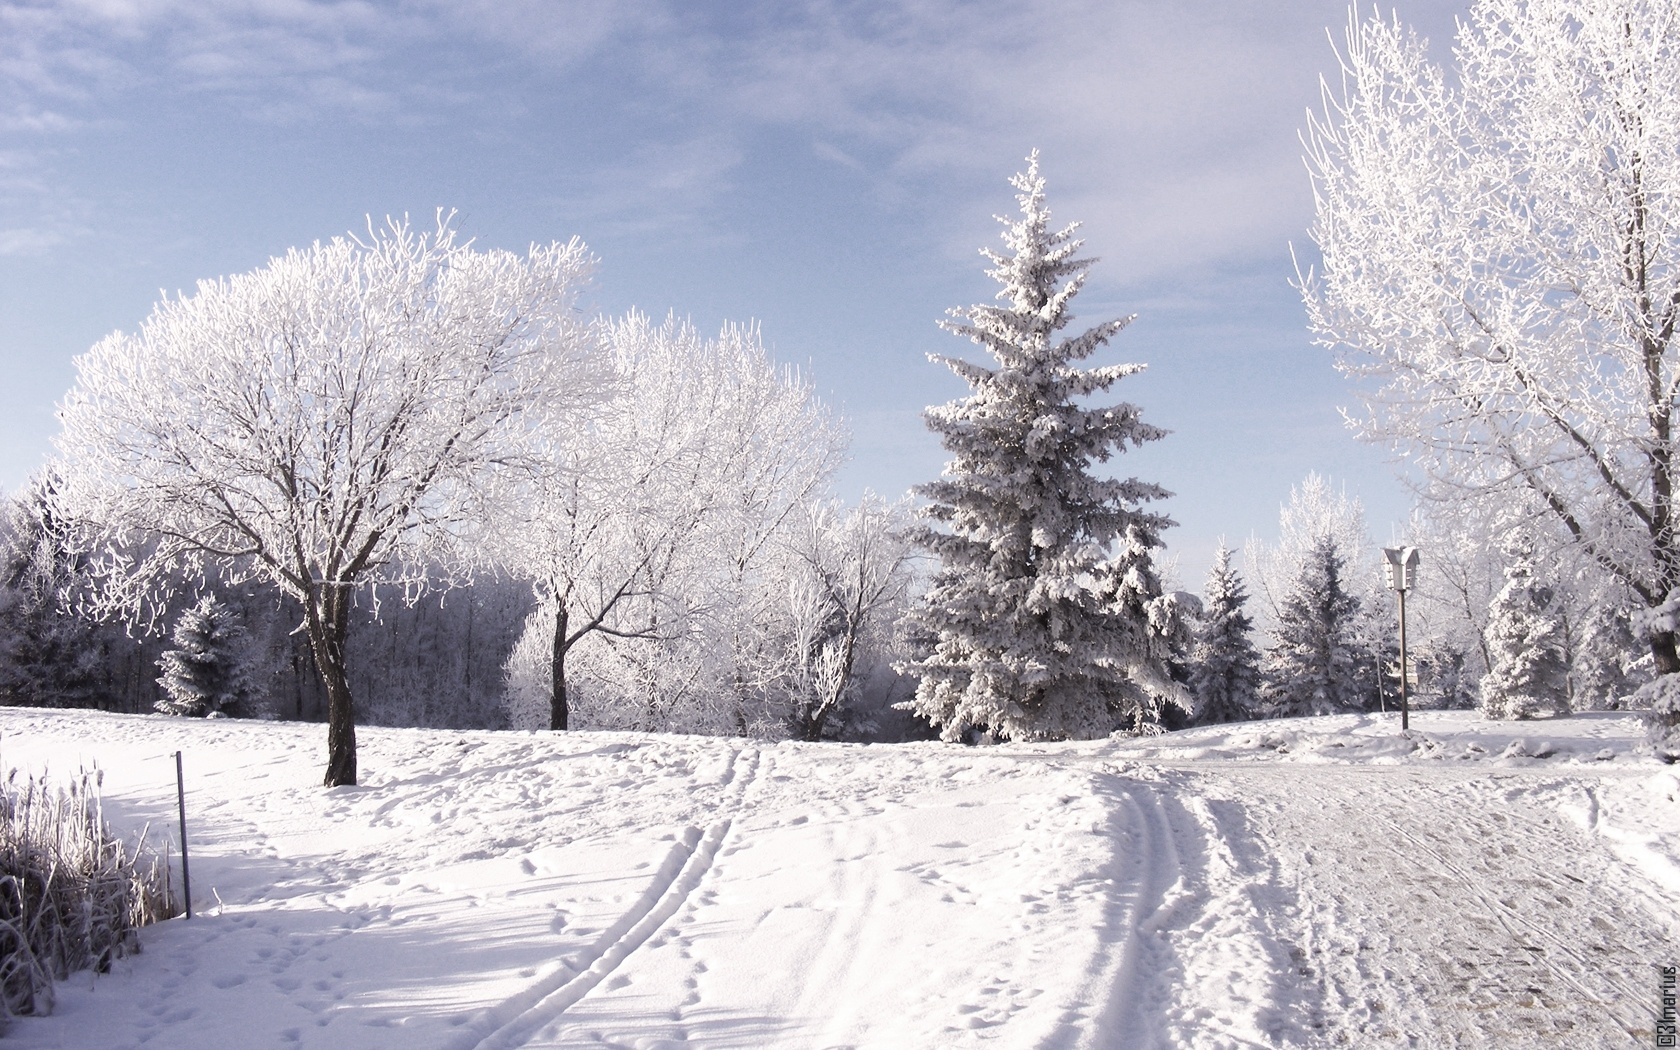 Winter Beautiful Wallpaper